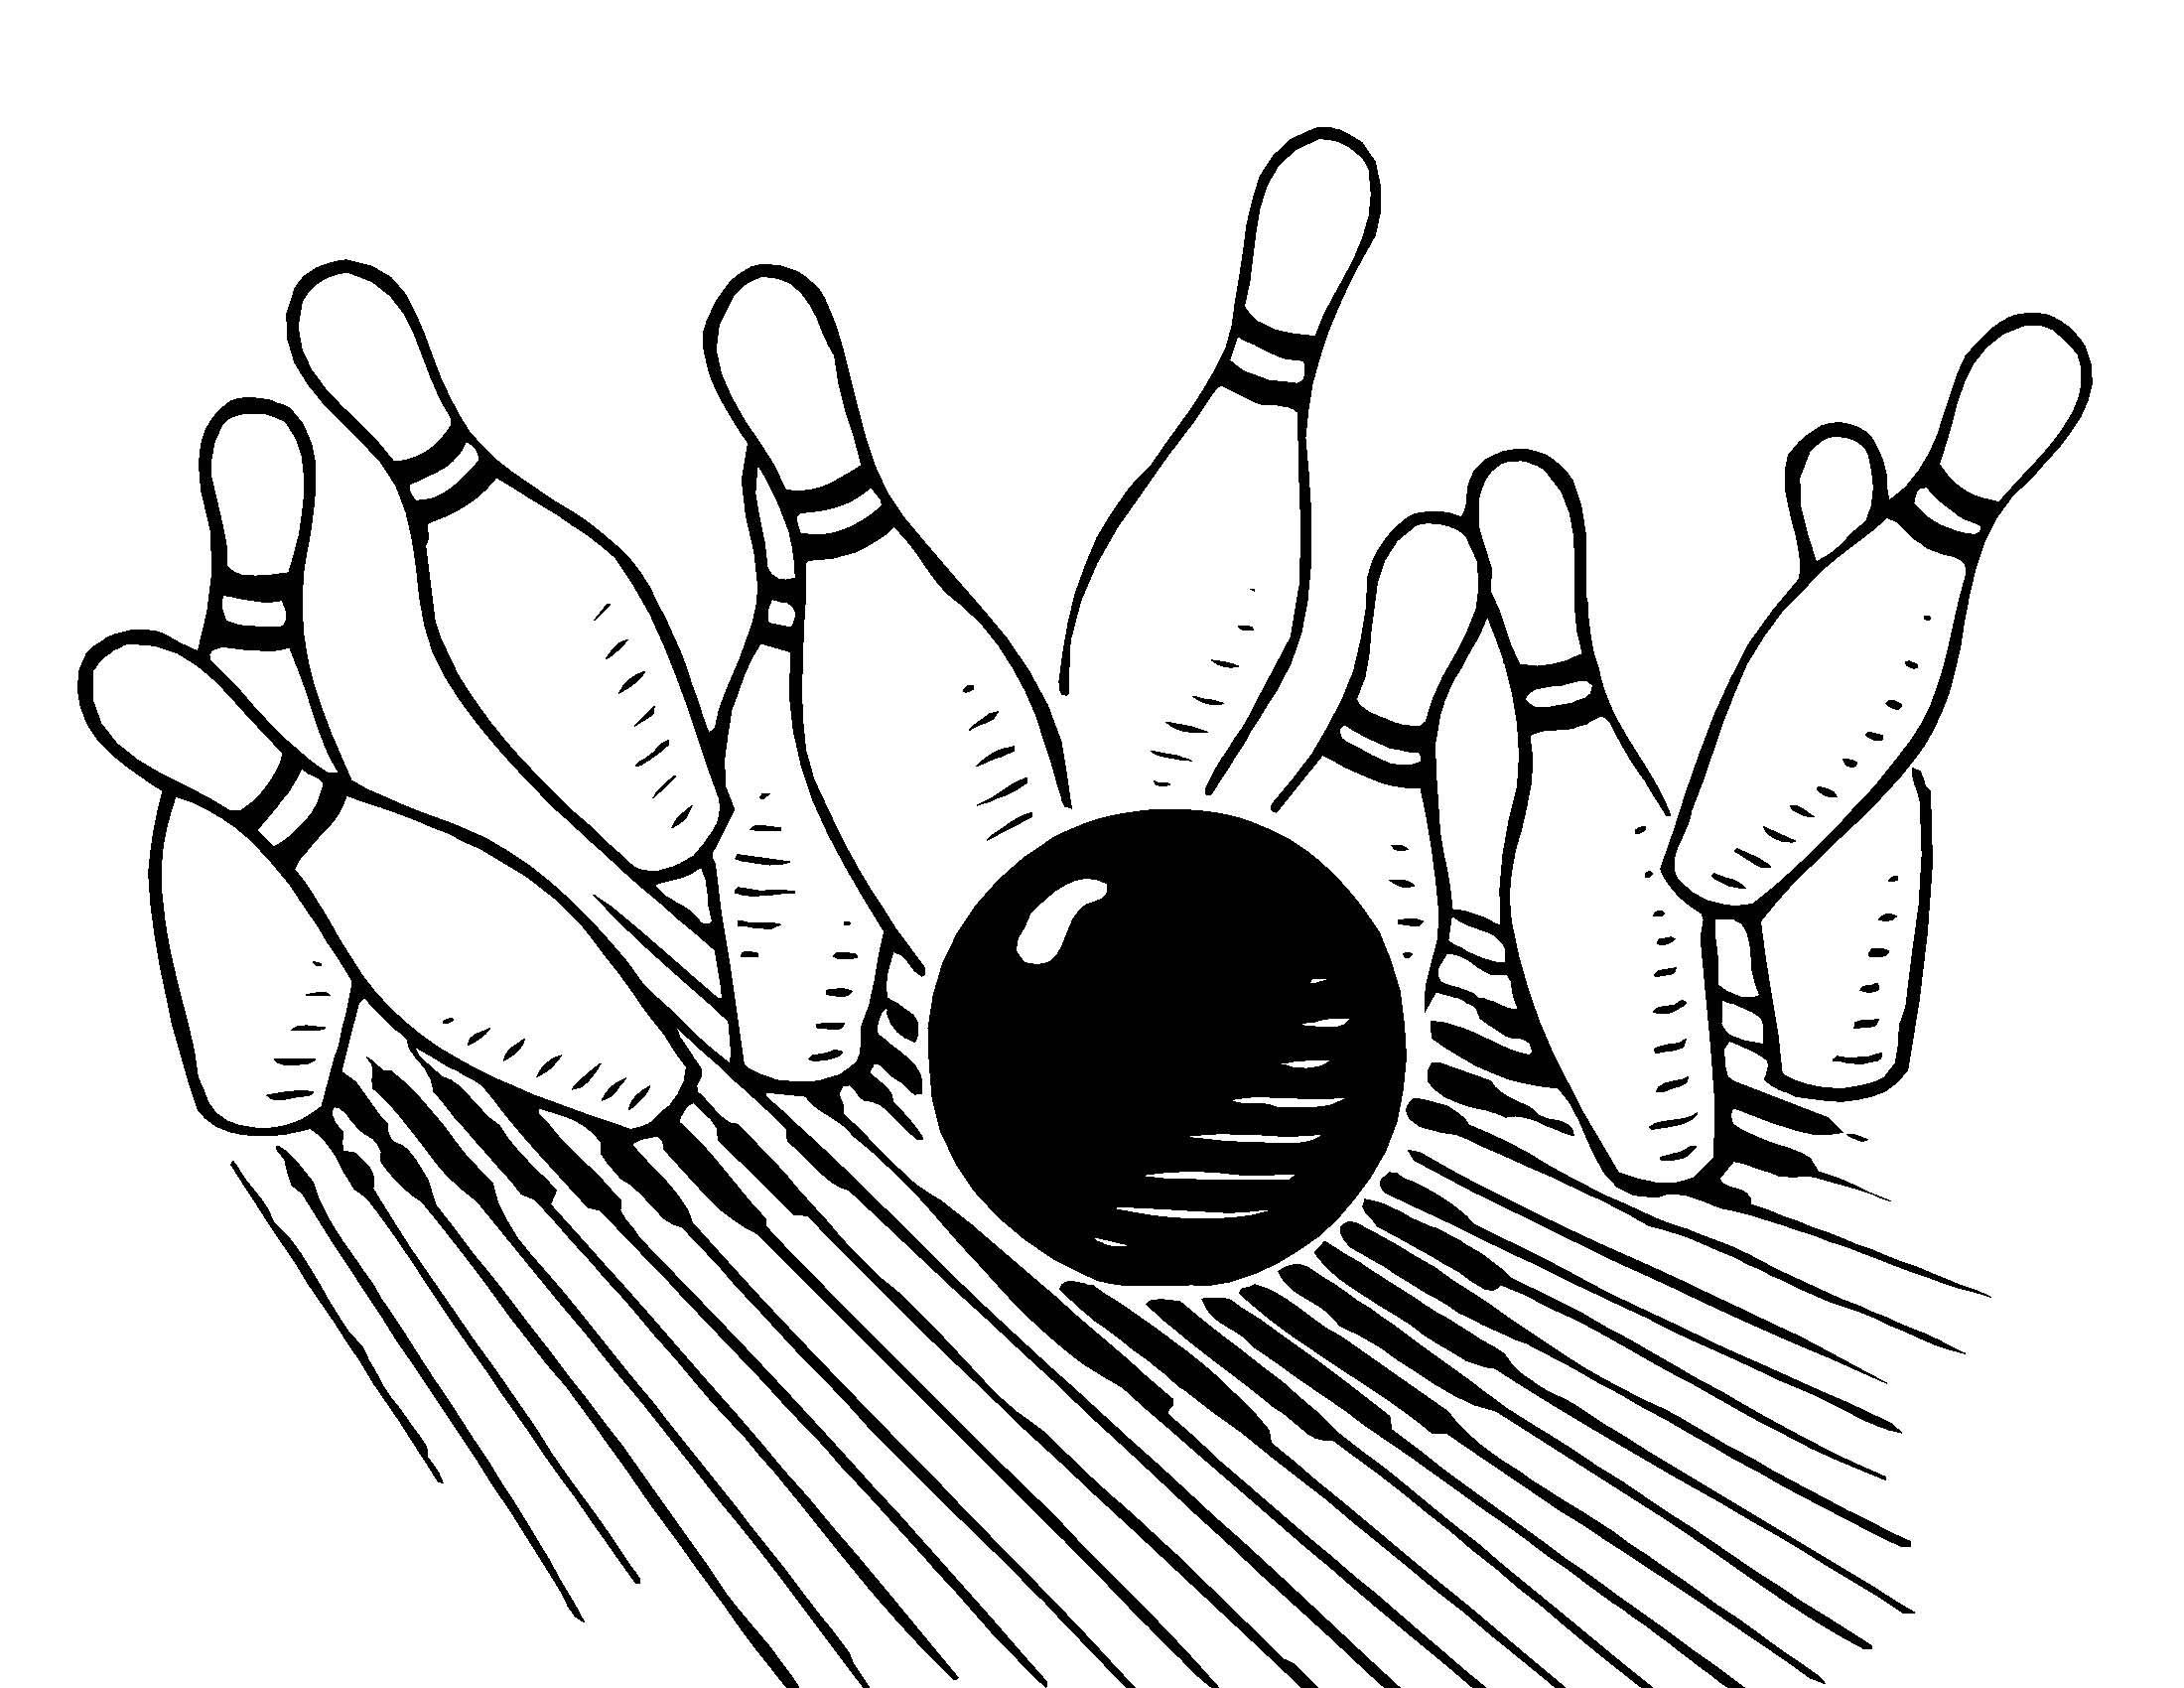 2200x1700 Bowling Pin And Ball